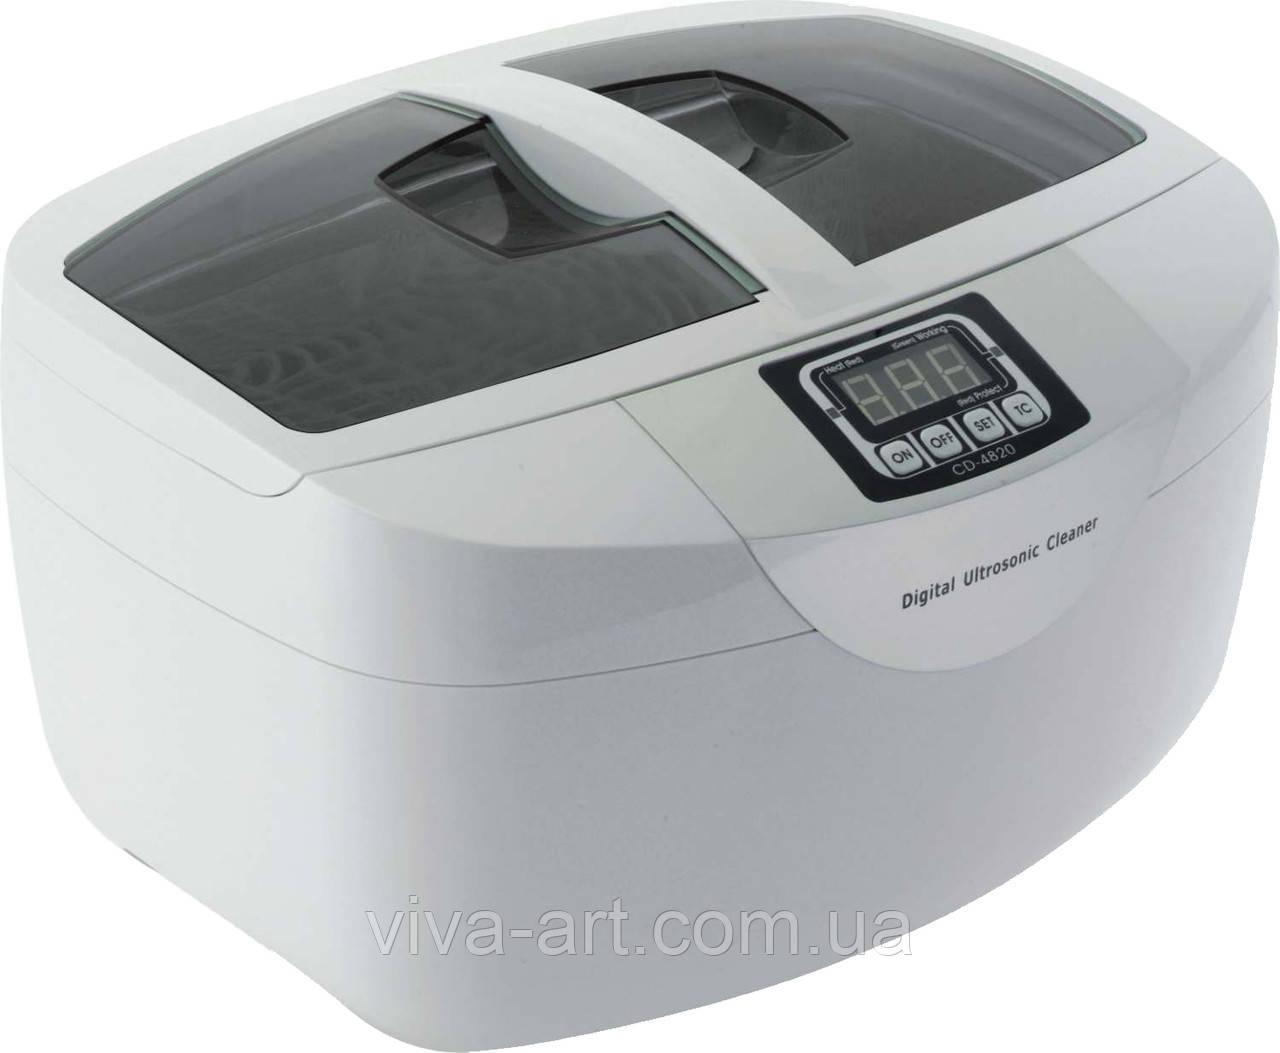 Професійна ультразвукова мийка СD - 4820 (2,5 л)